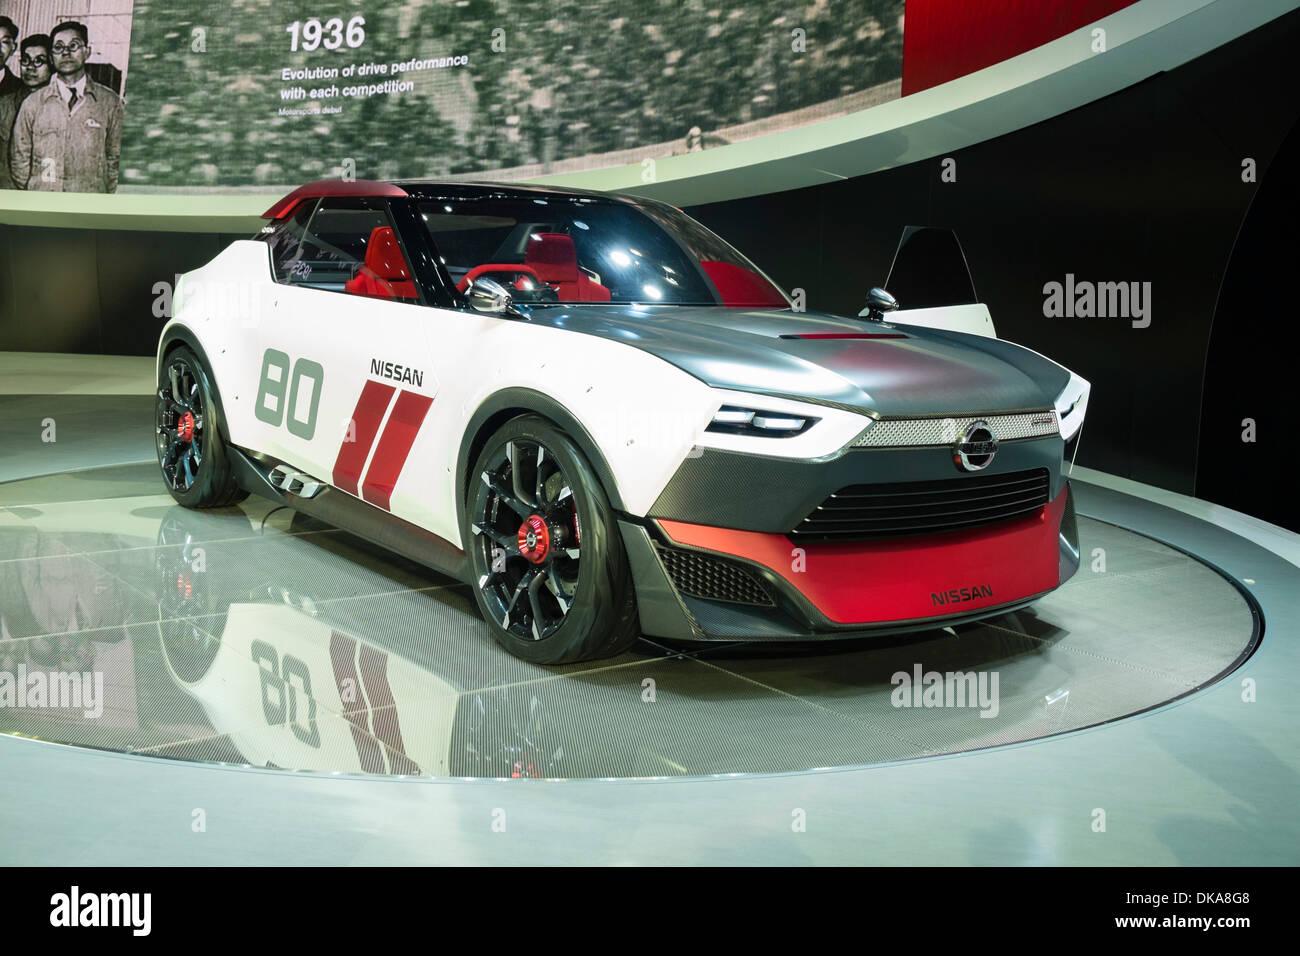 Nissan IDx Freeflow concept car al Motor Show di Tokyo 2013 in Giappone Immagini Stock